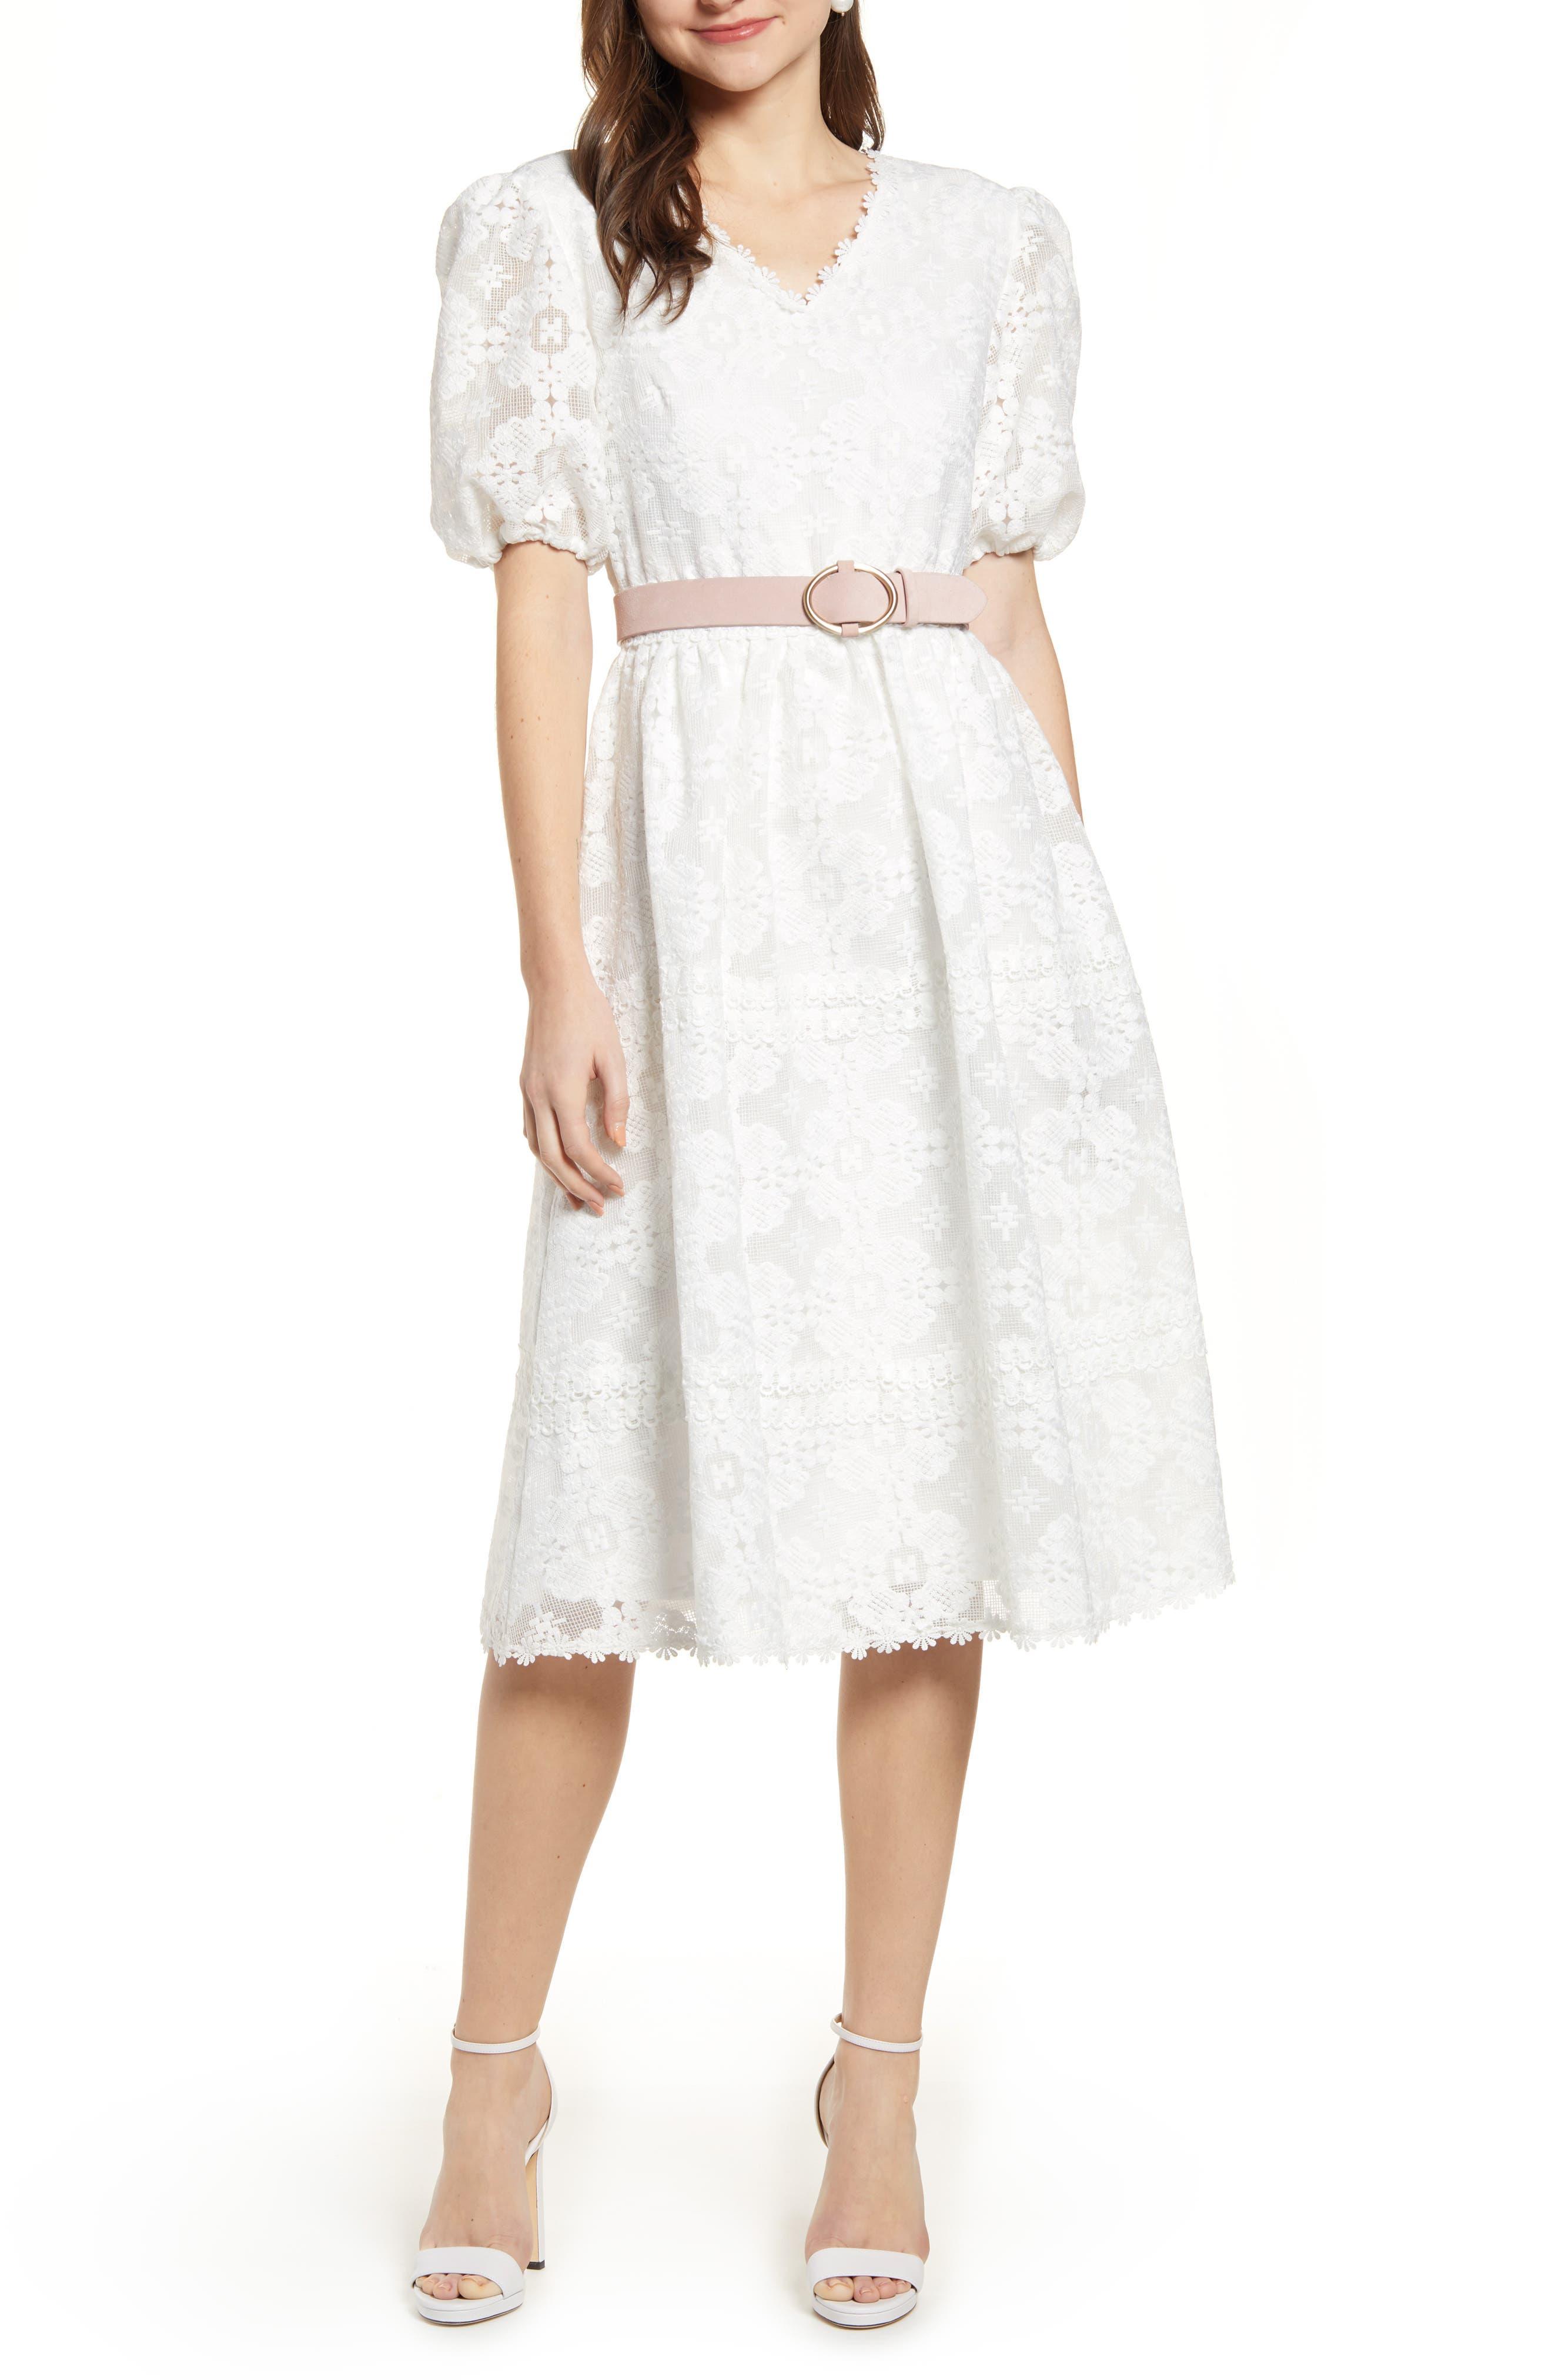 Nordstrom Lace Dresses